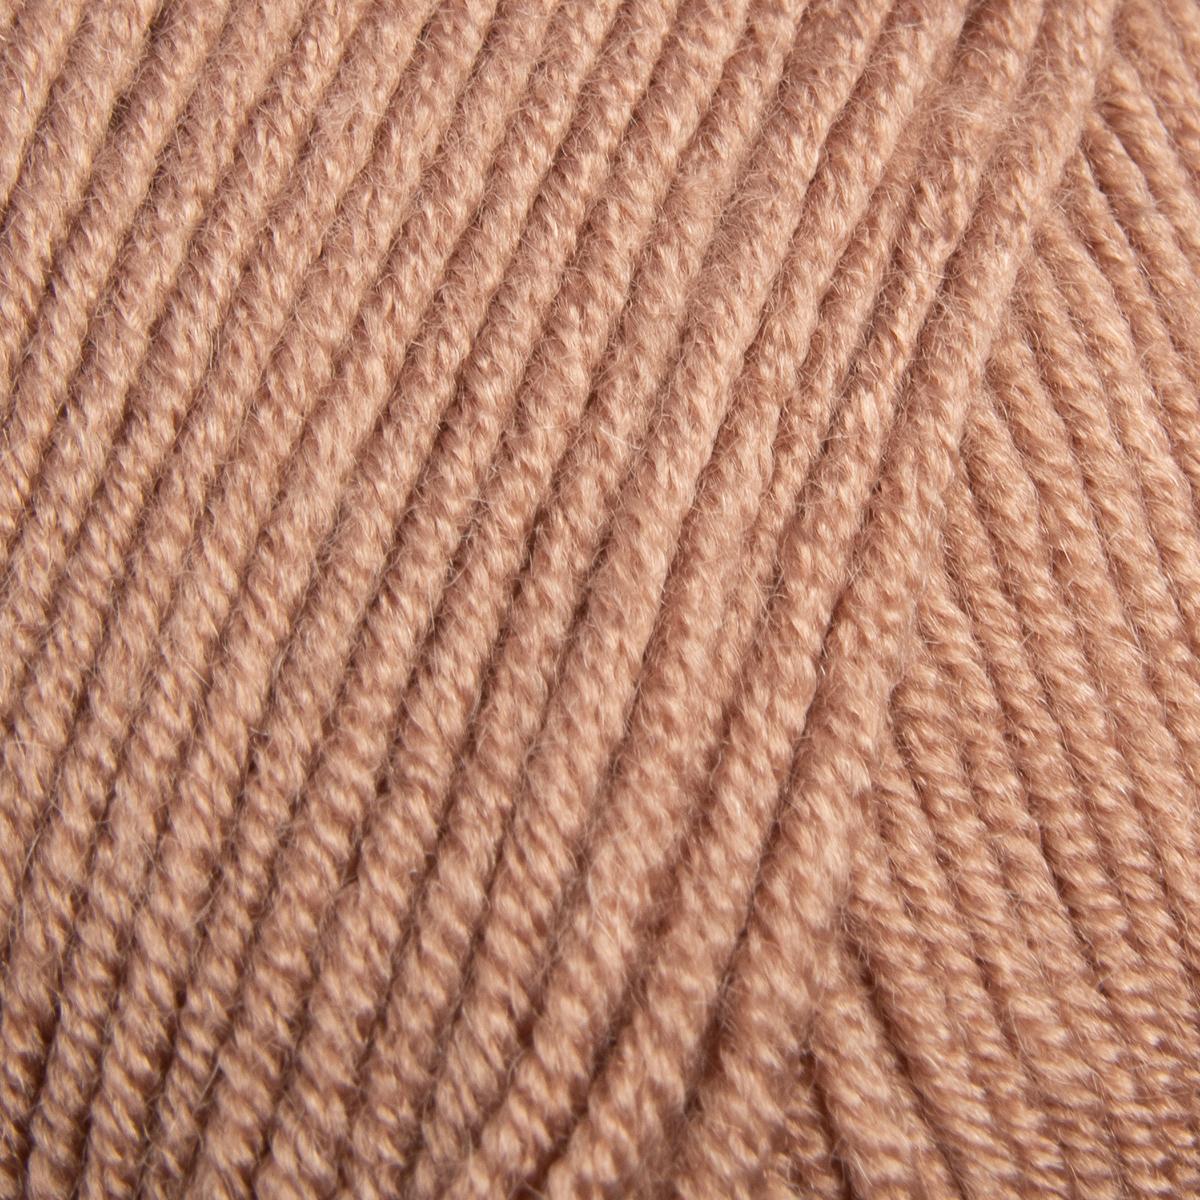 3pk-Lion-Brand-Vanna-039-s-Style-100-Acrylic-Yarn-Light-3-Knit-Crochet-Skeins-Soft thumbnail 18